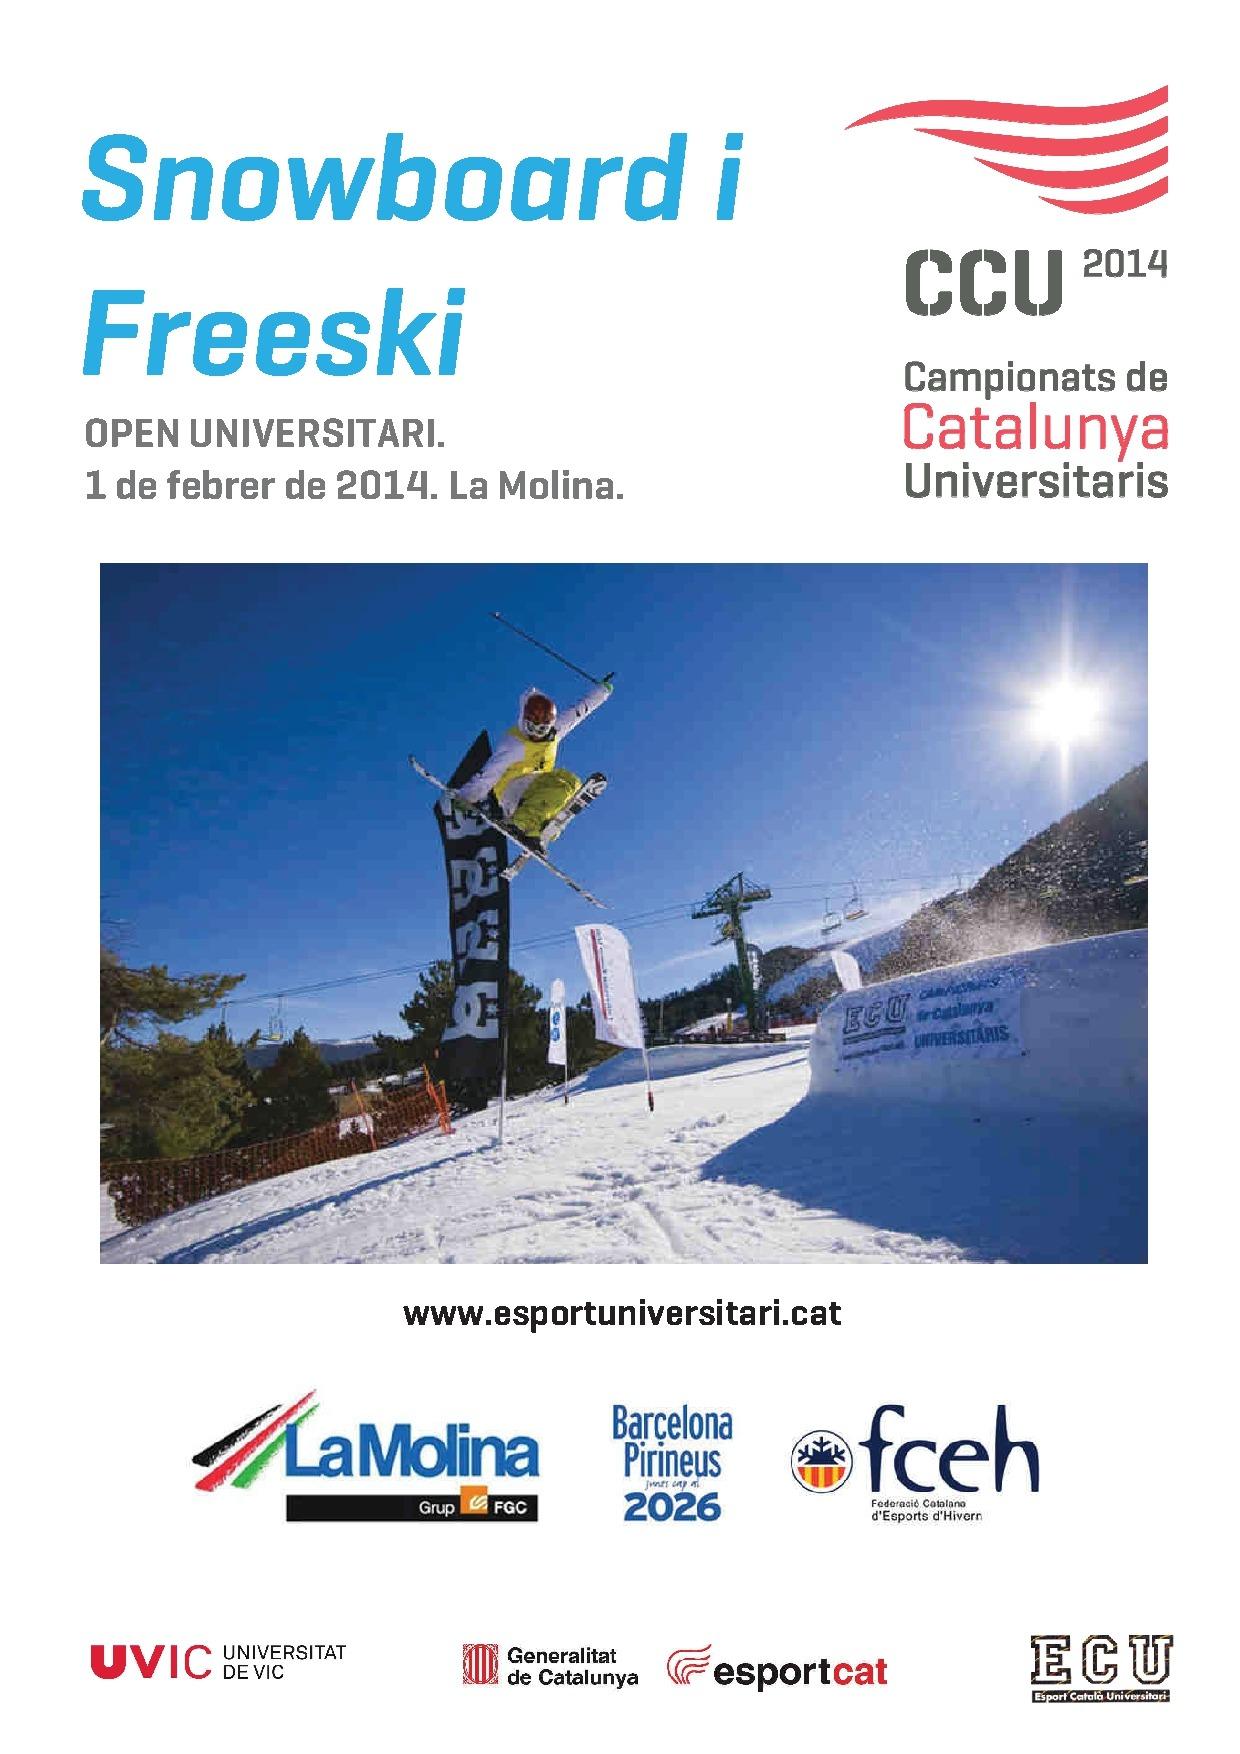 CCU Campionat de Catalunya Universitaris 2014